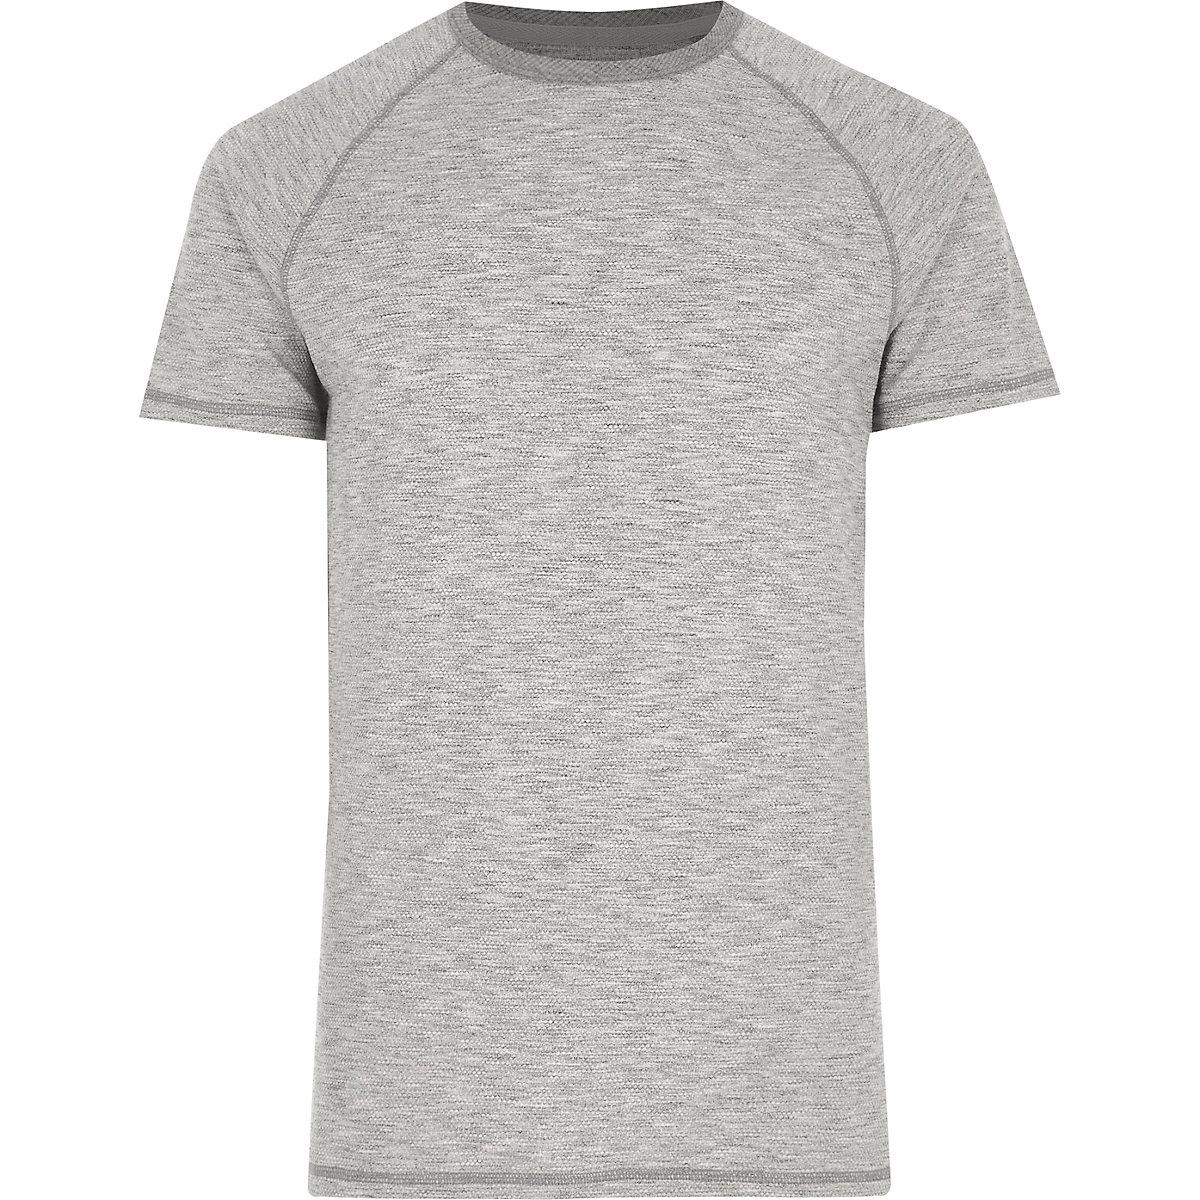 Grey marl short sleeve raglan T-shirt